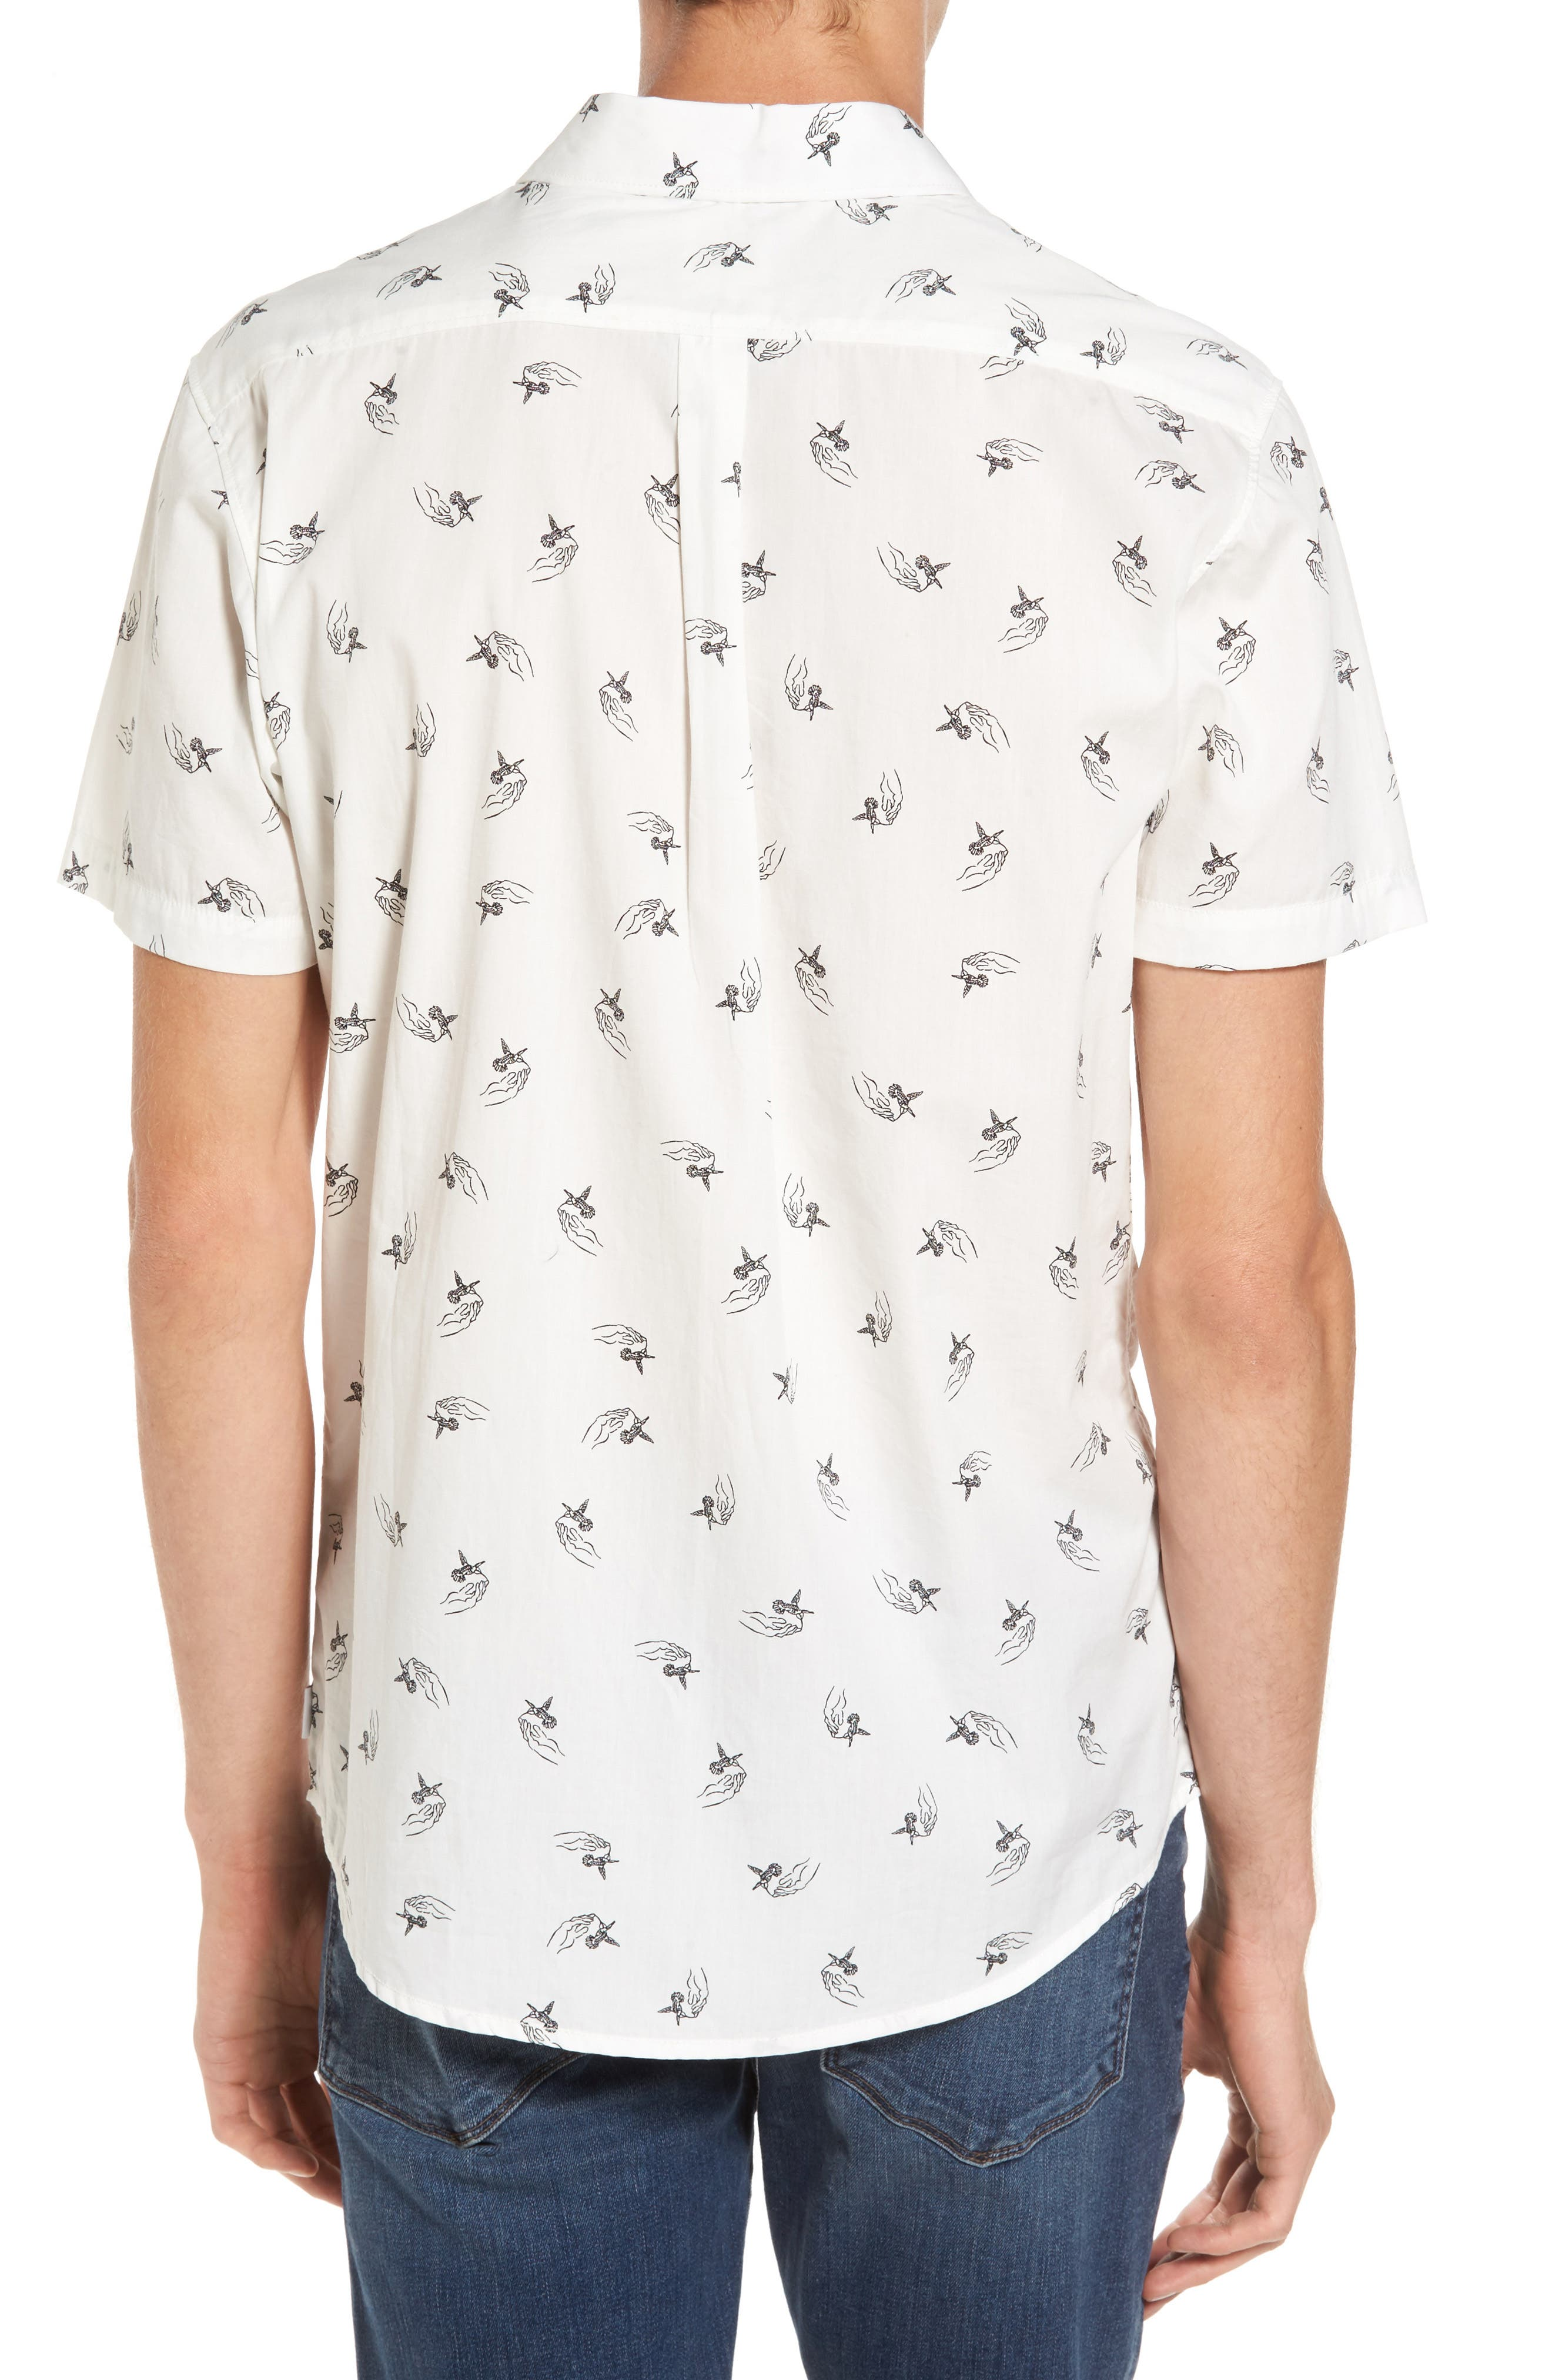 x Kevin Long Hummingbird Woven Shirt,                             Alternate thumbnail 2, color,                             Antique White